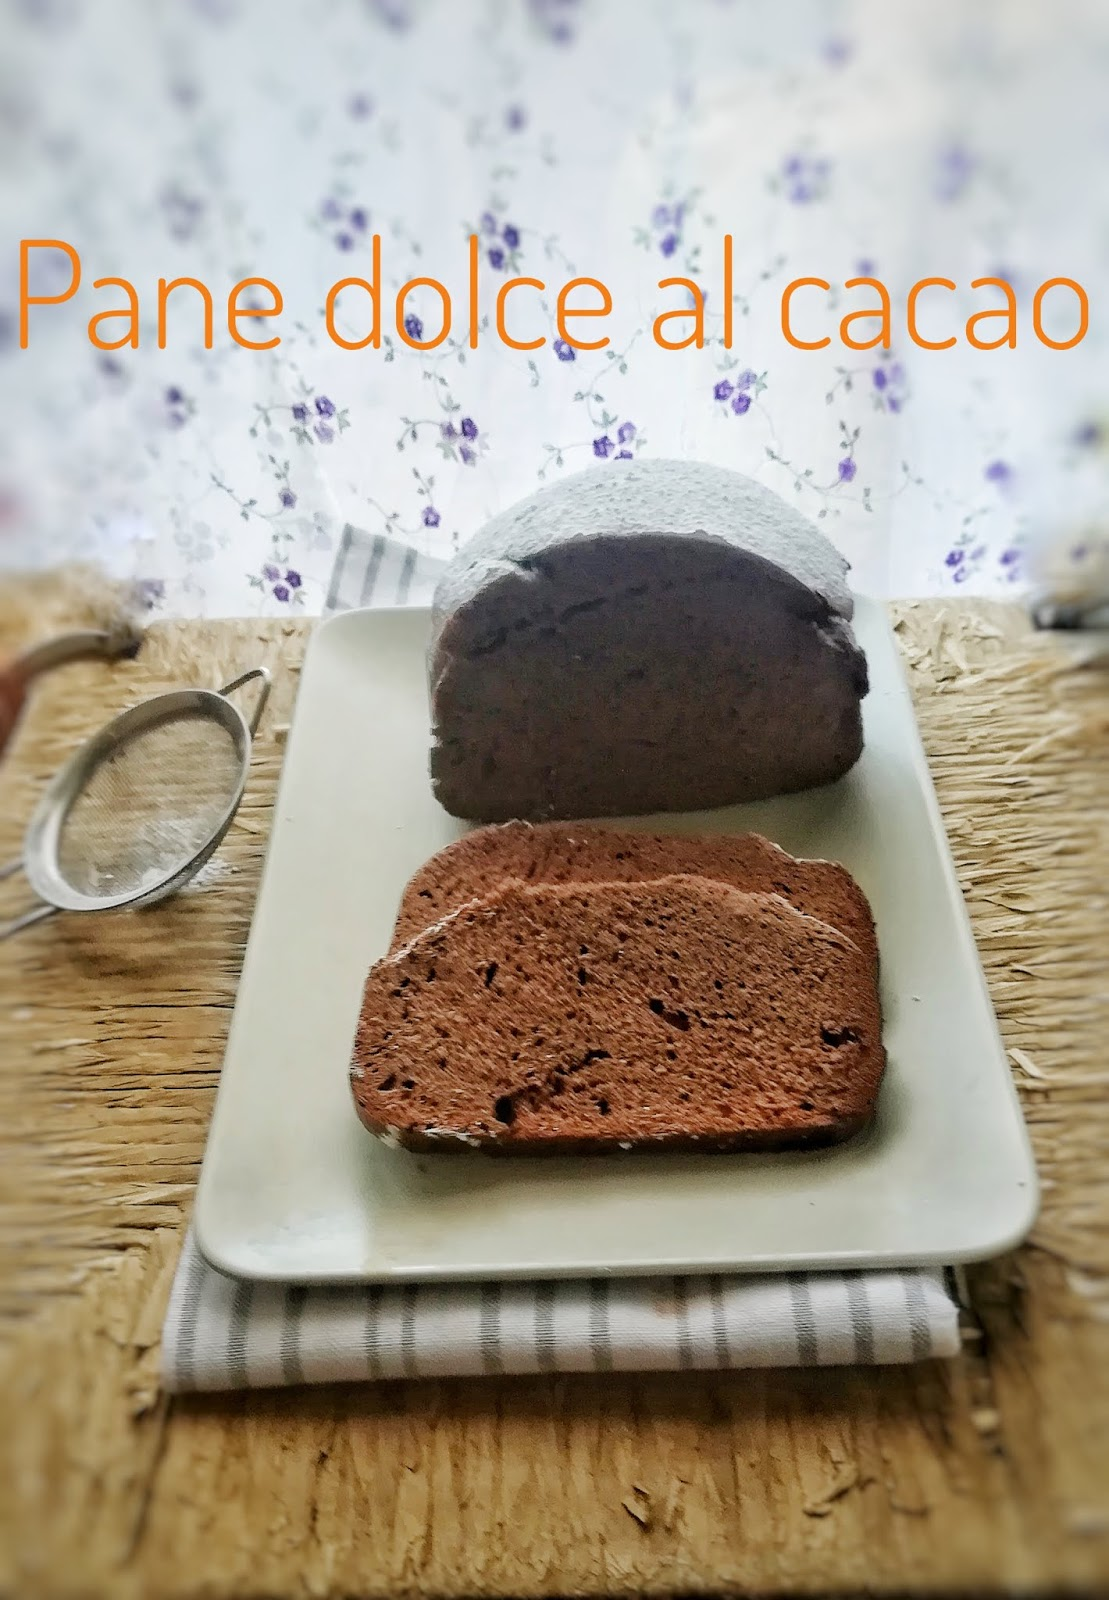 I Segreti Del Pane pane dolce al cacao e i segreti della macchina del pane